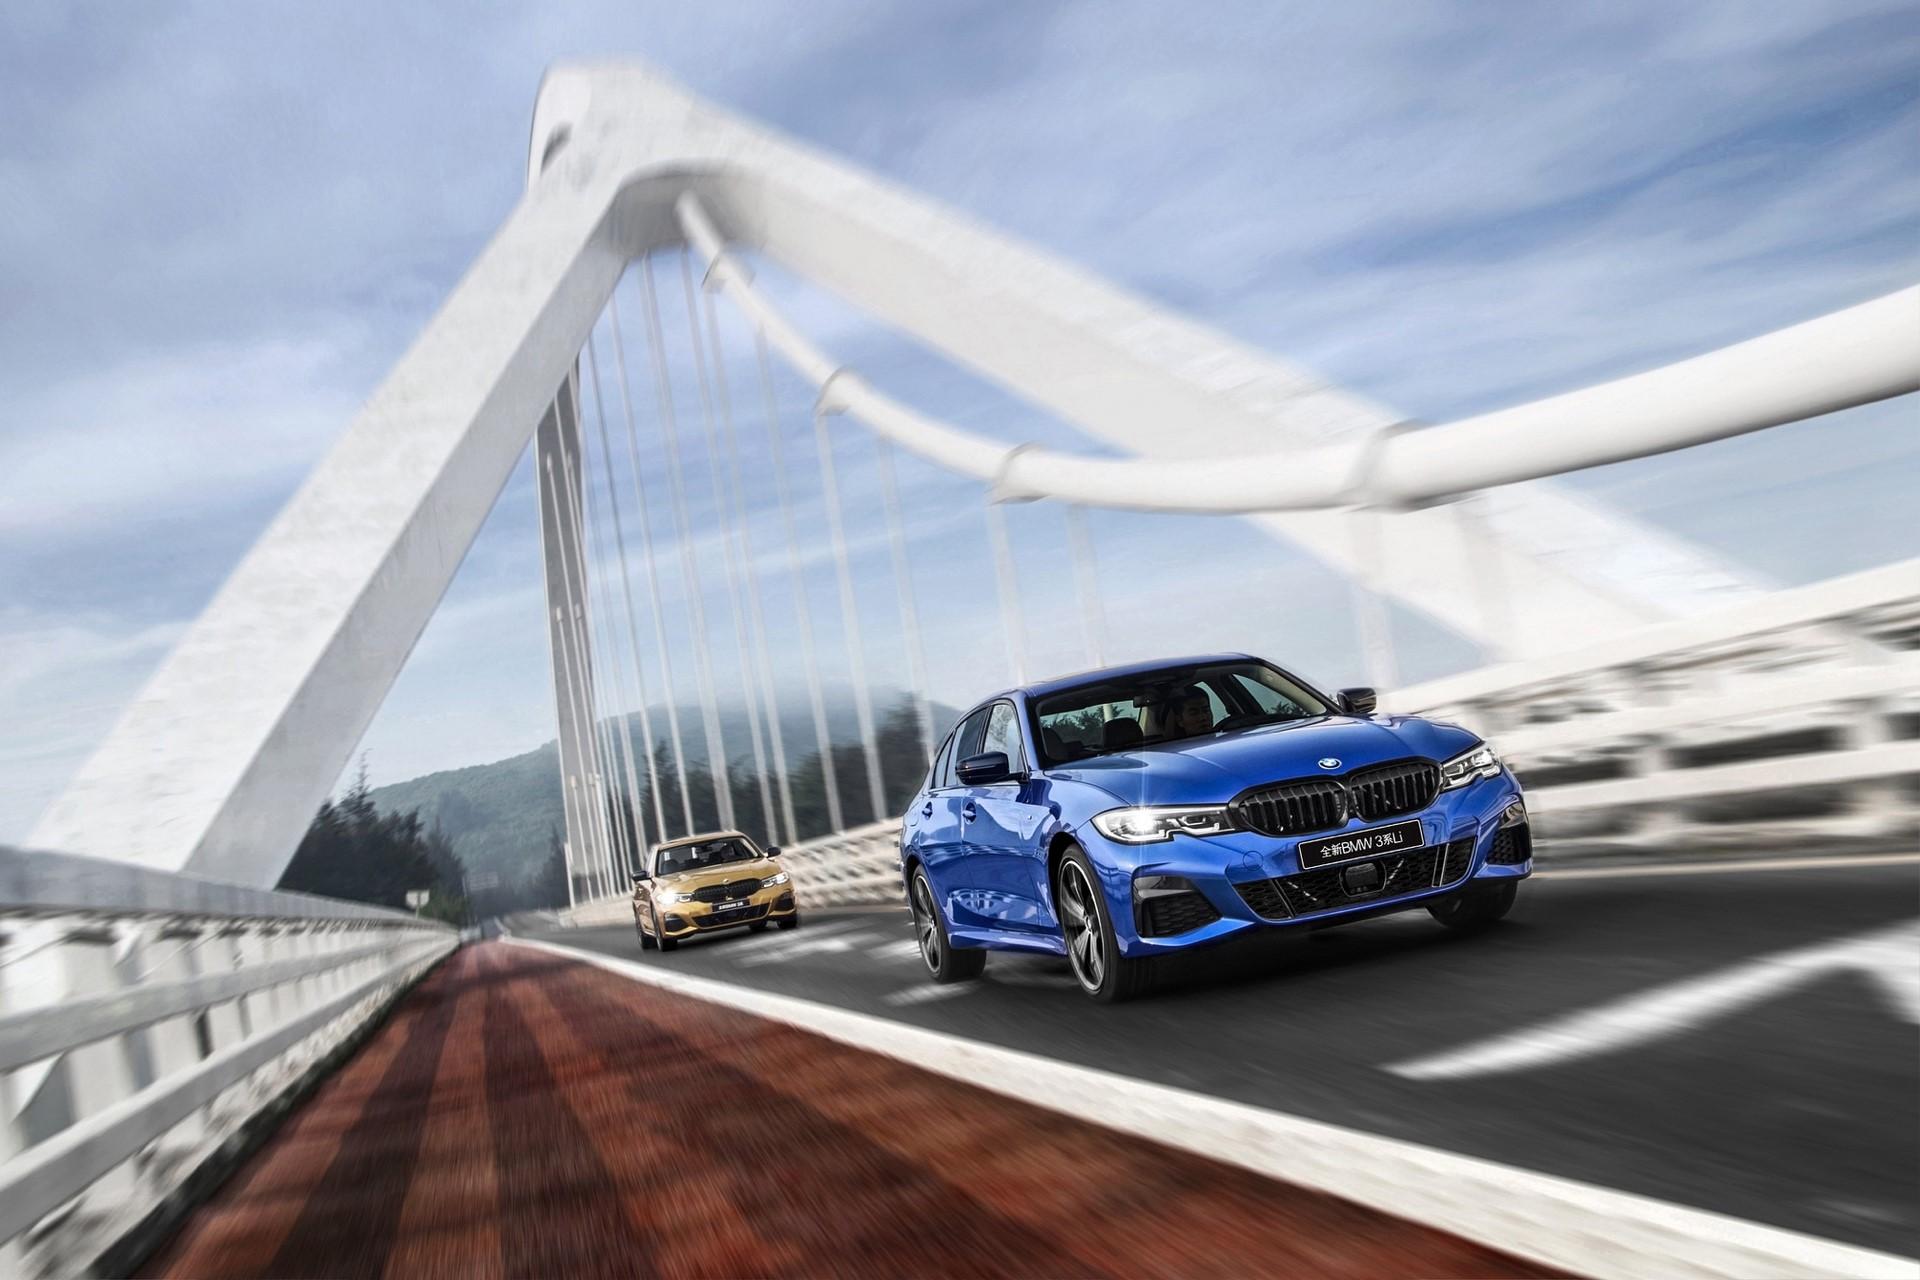 BMW-3-Series-LWB-Long-Wheelbase-2019-12